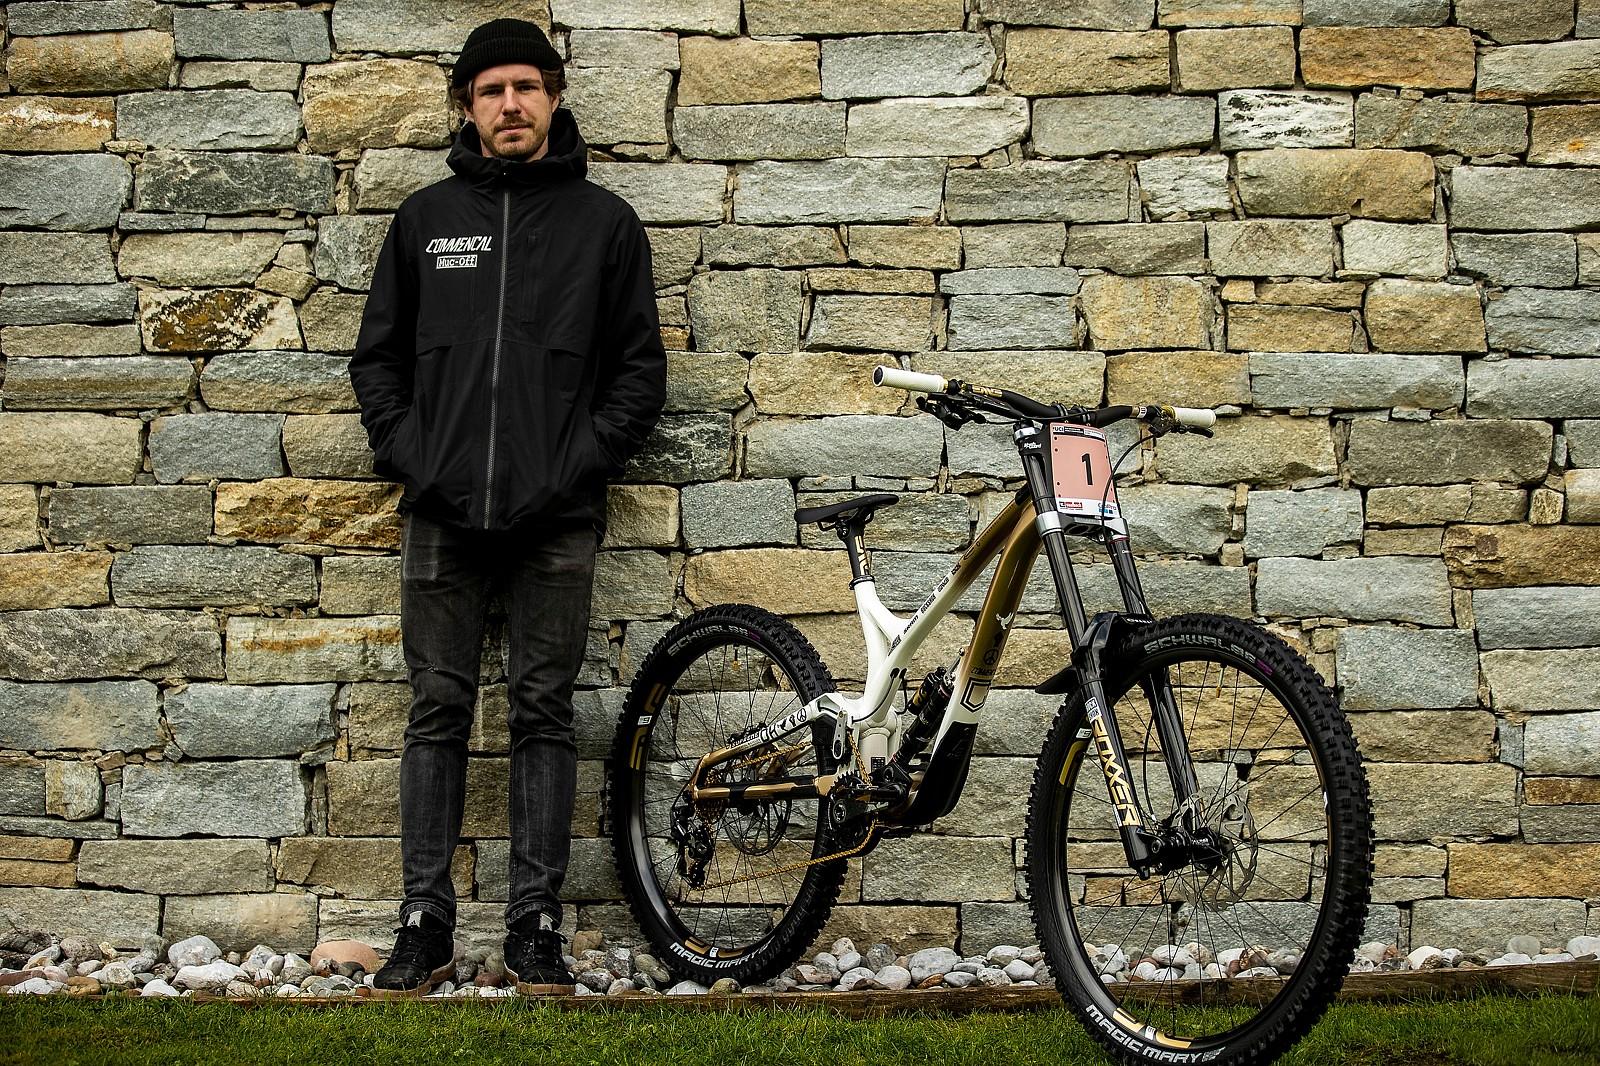 Maxime Augin, Myriam's Mechanic - WORLD CHAMPS BIKE - Myriam Nicole's Commencal Supreme - Mountain Biking Pictures - Vital MTB